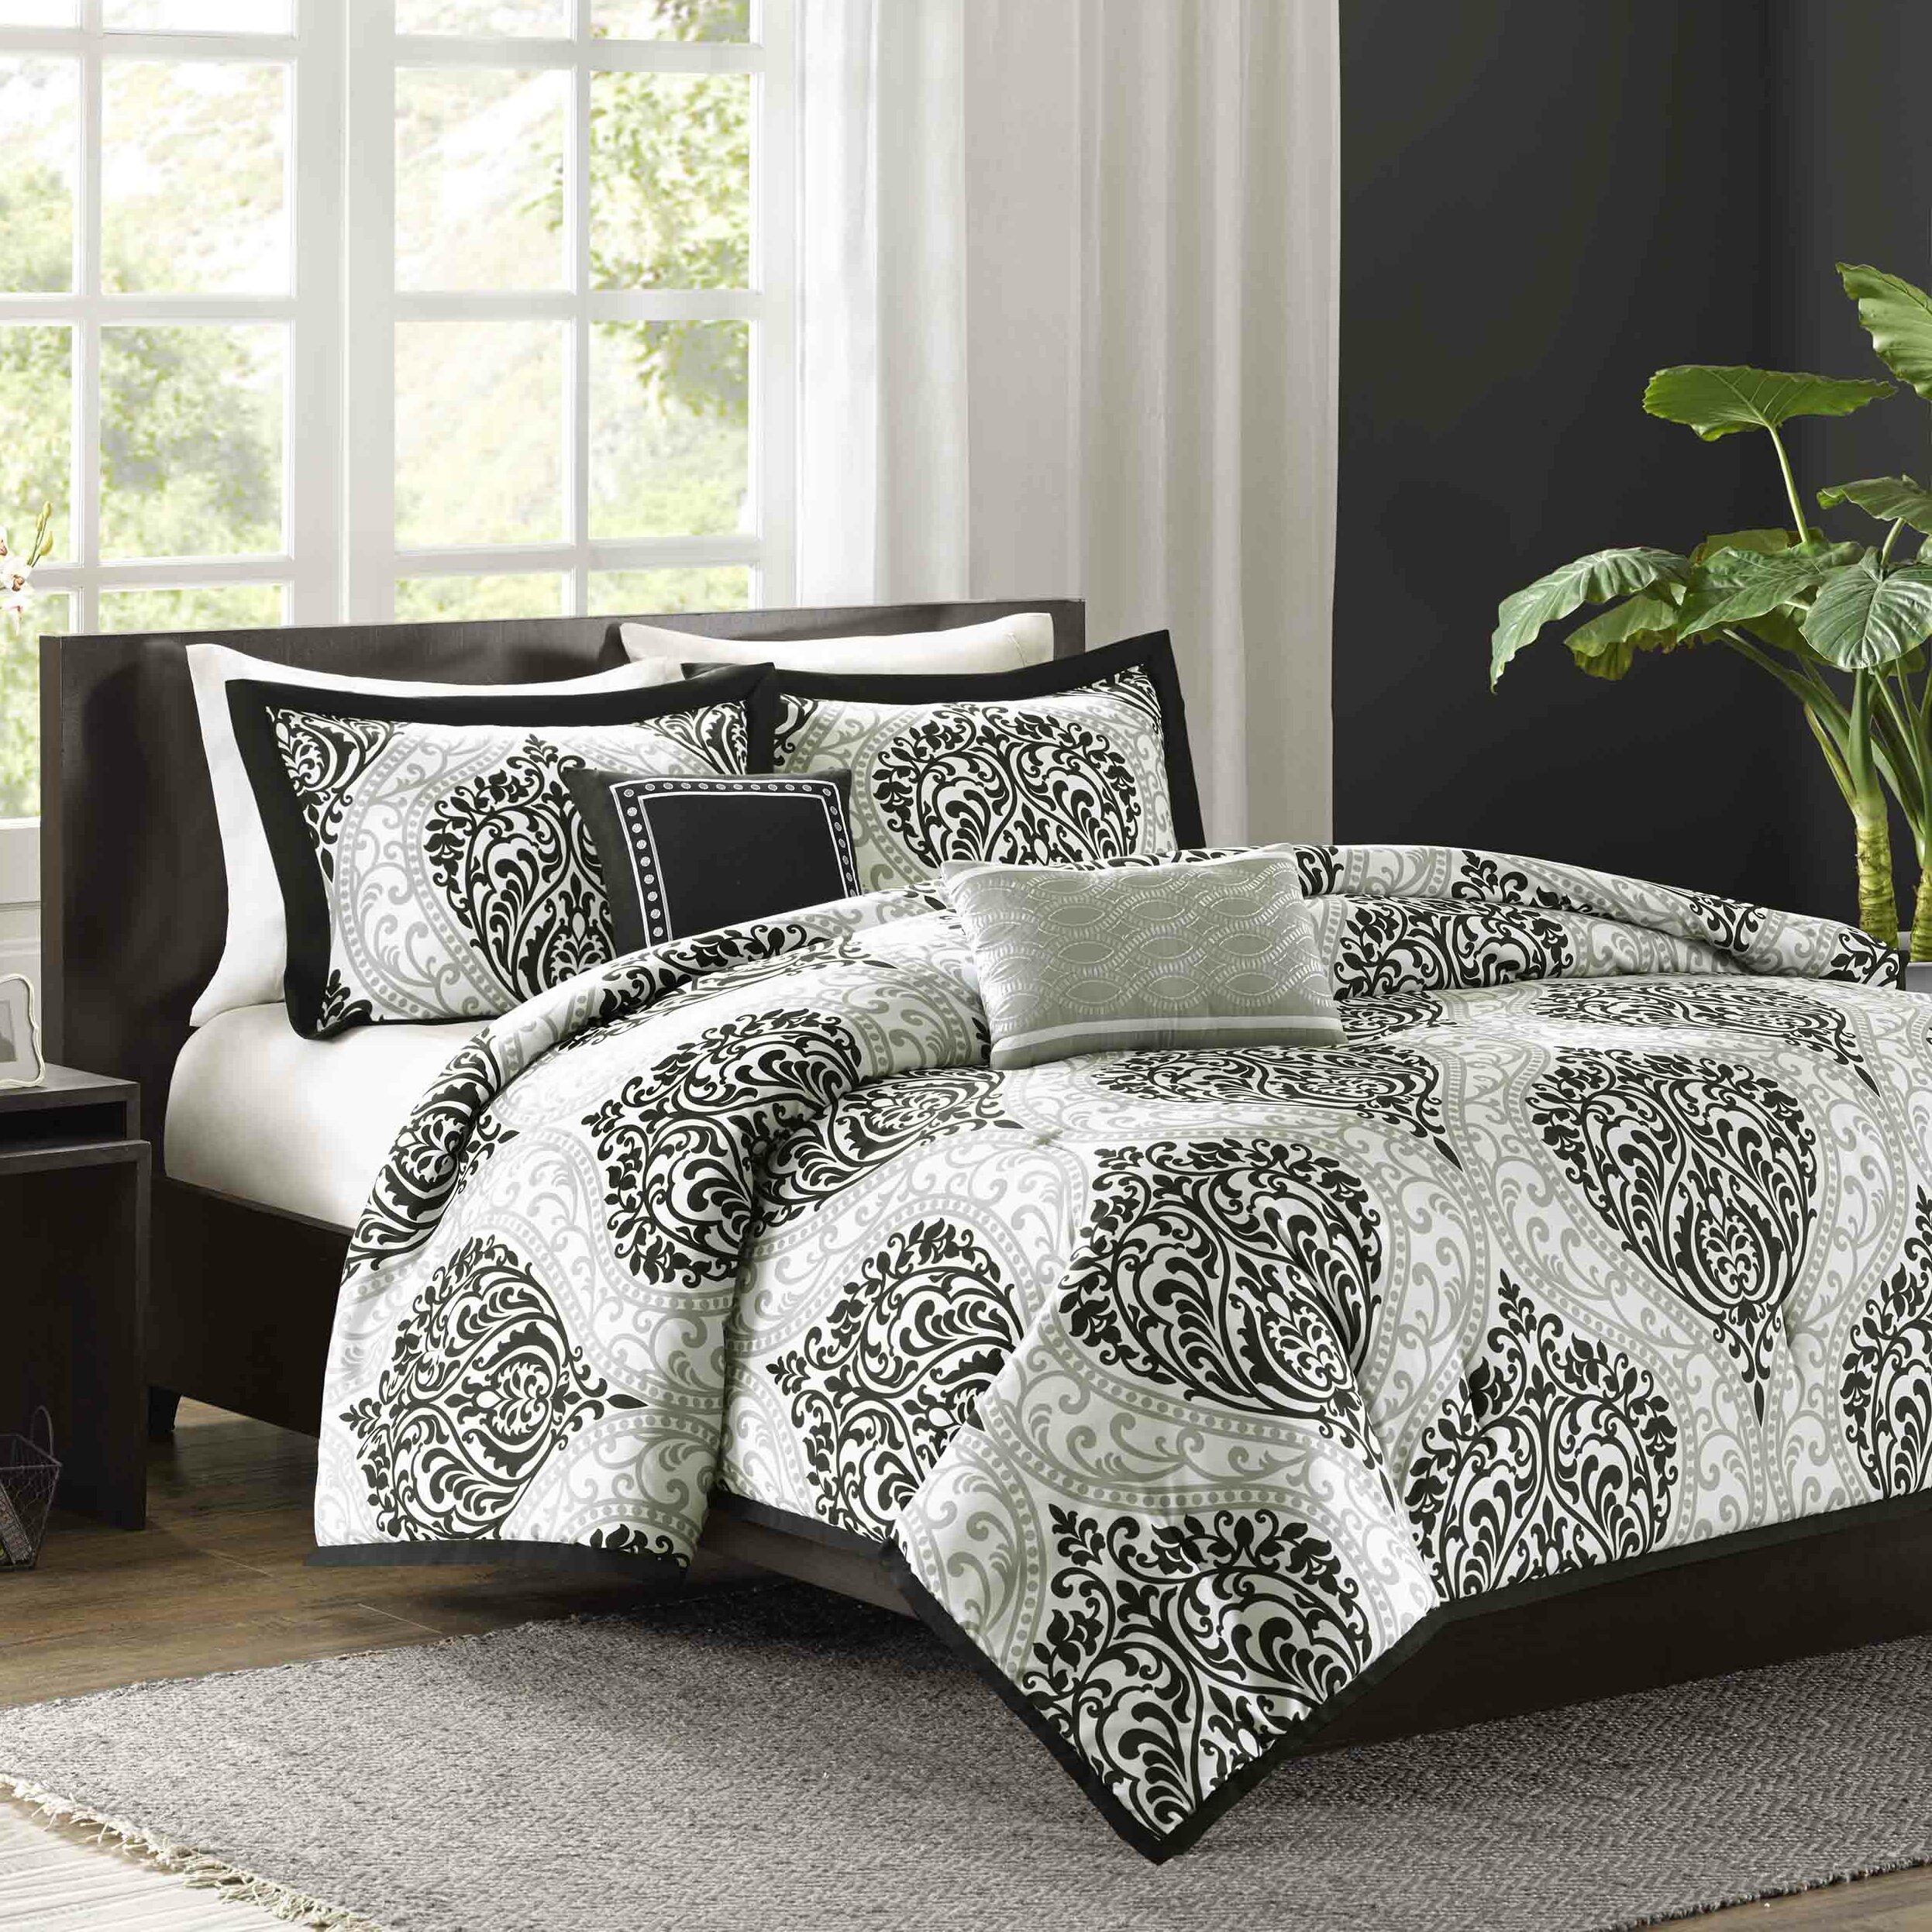 intelligent design senna 5 piece king california king duvet cover set reviews wayfair. Black Bedroom Furniture Sets. Home Design Ideas